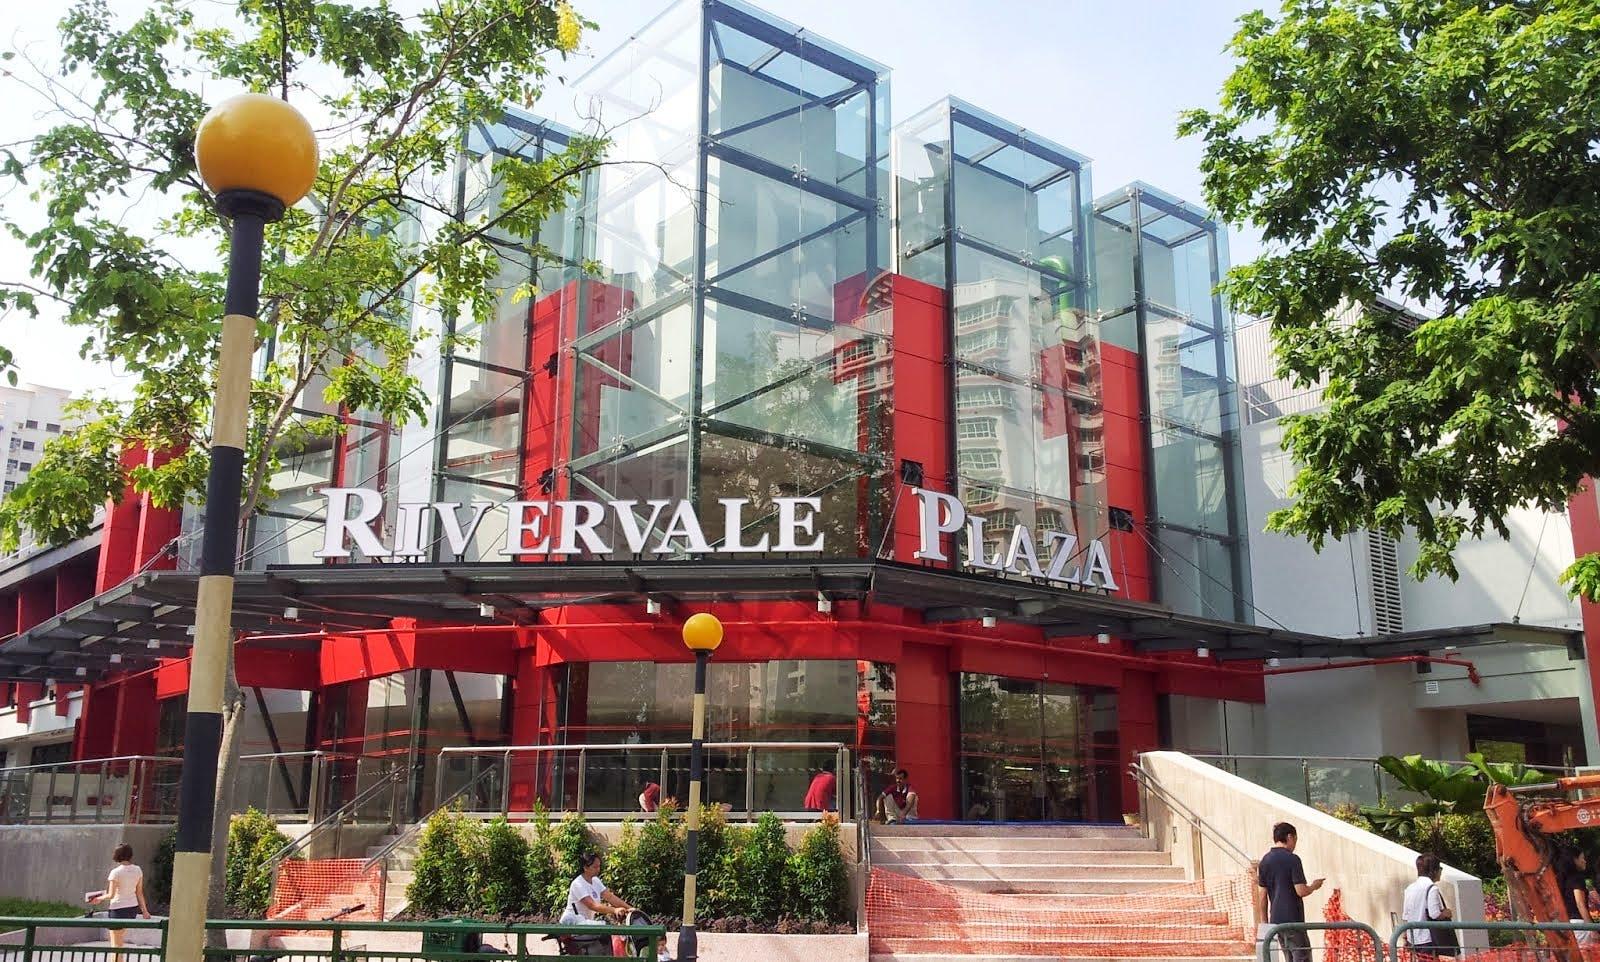 Rivervale Plaza